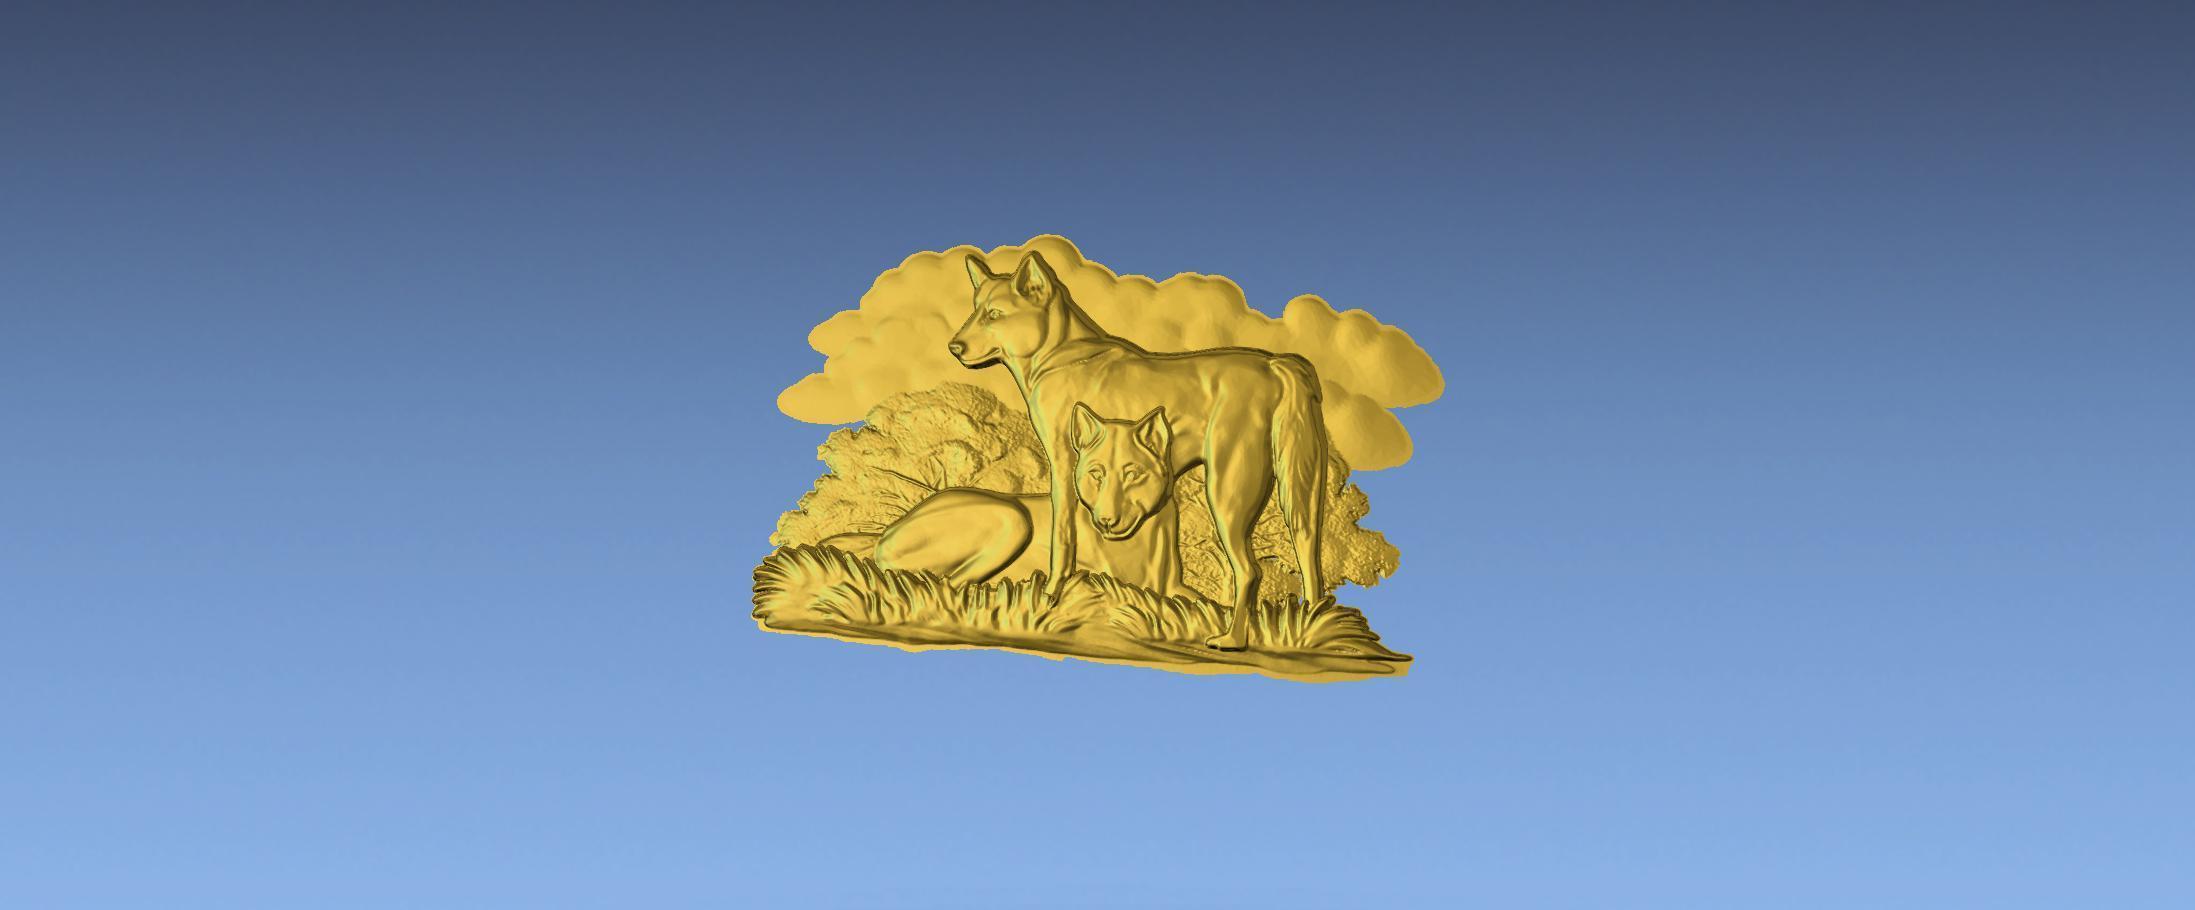 1.jpg Download free STL file AUSTRALIAN DINGOS 3D STL FILE • 3D printer design, ALPHA_MENA